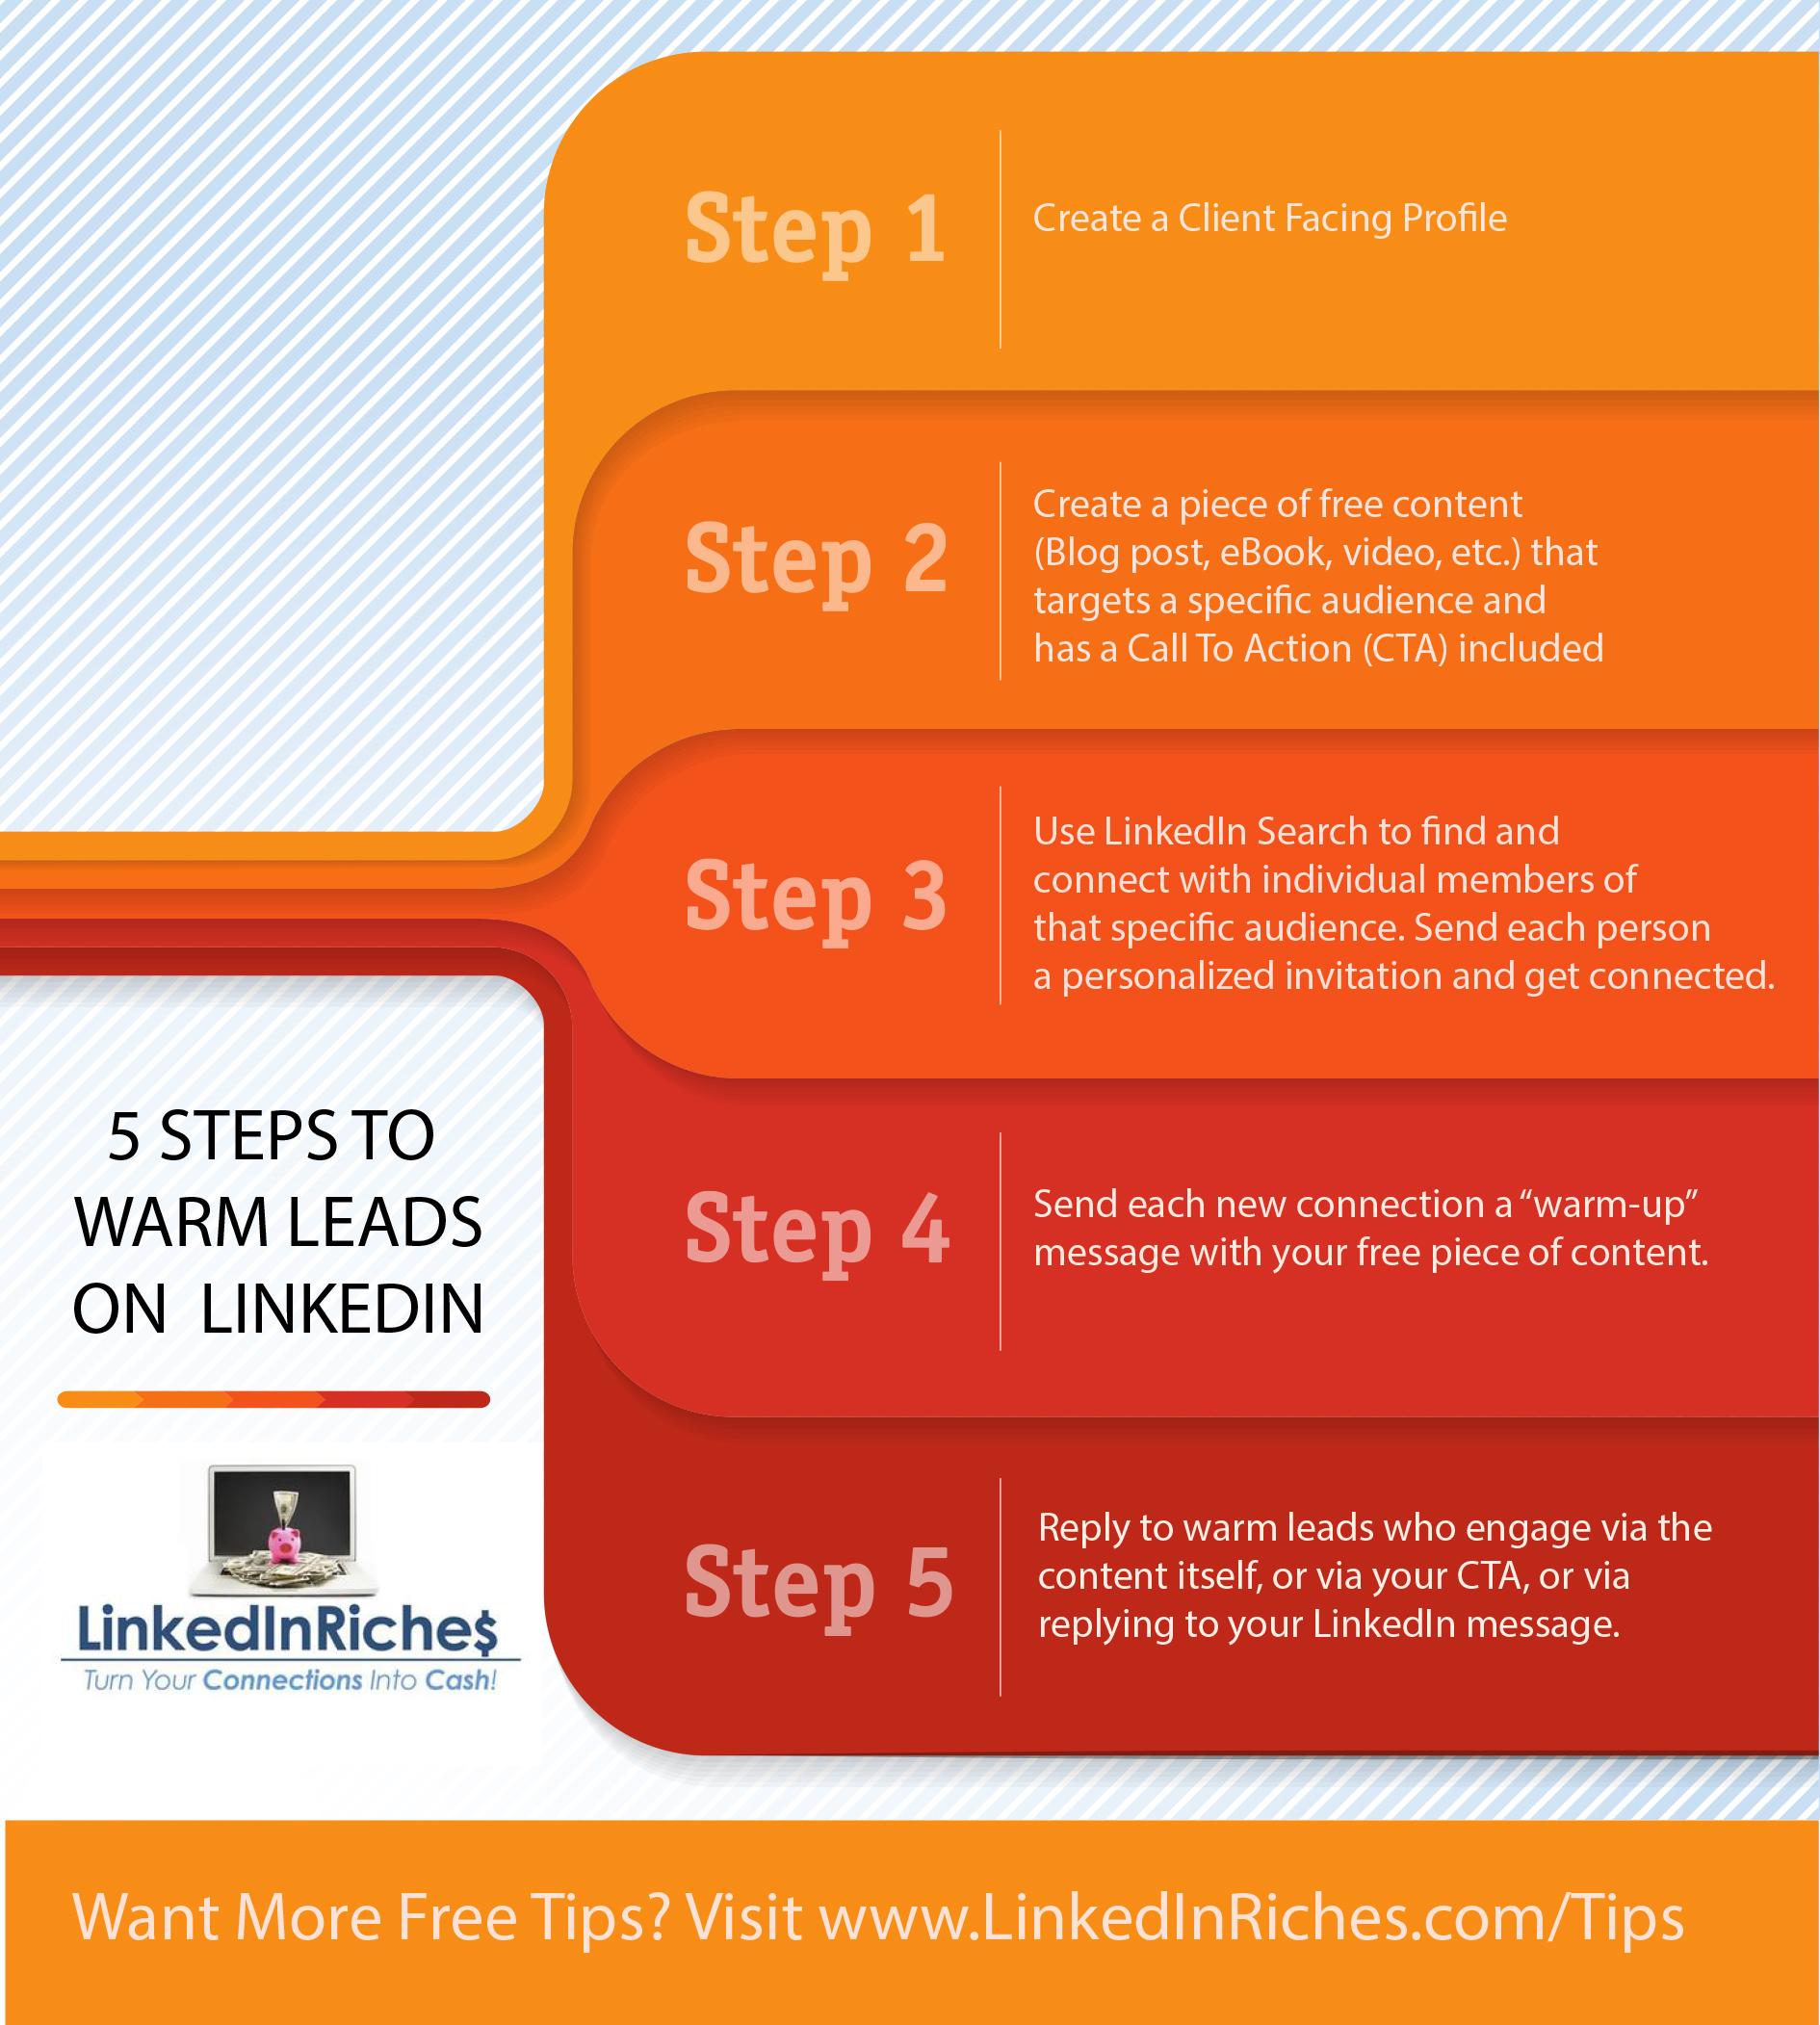 LinkedInRiches Infographic